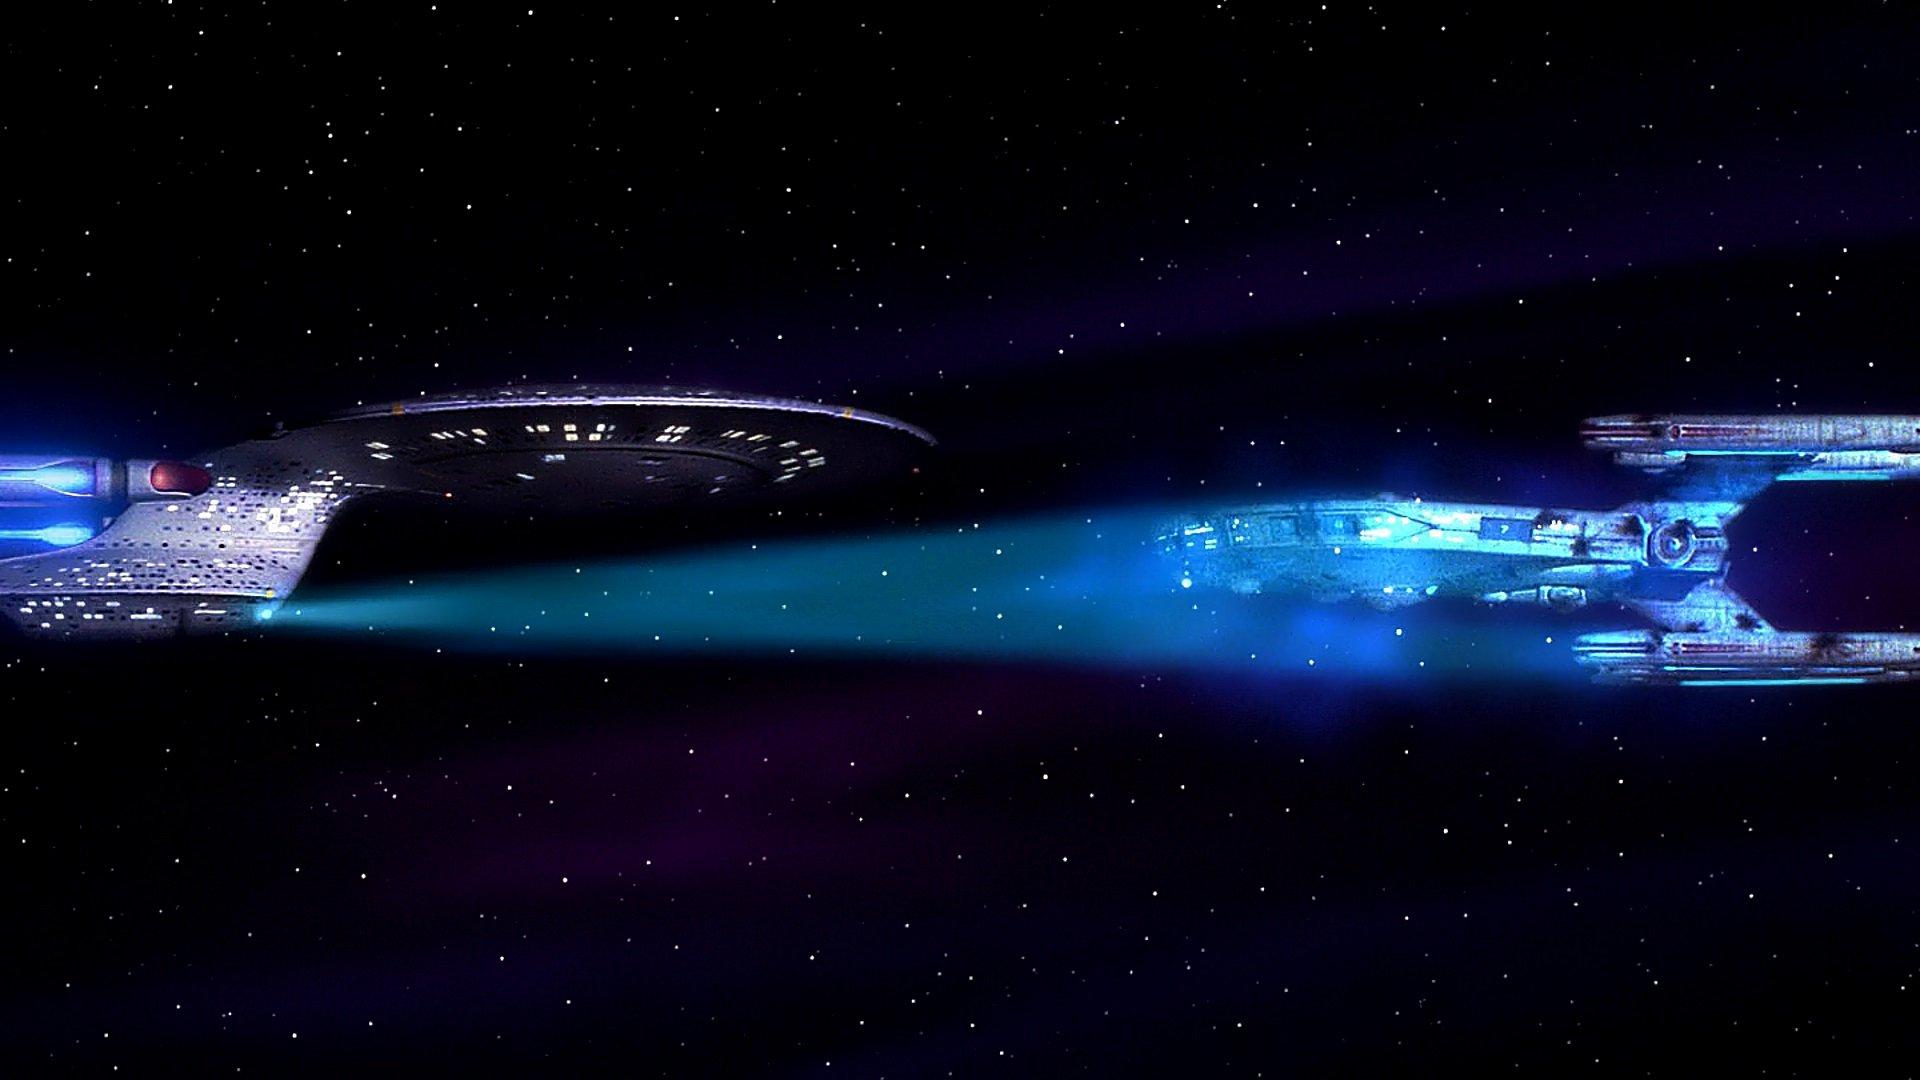 Star Trek: The Next Generation Wallpapers 1920x1080 Full